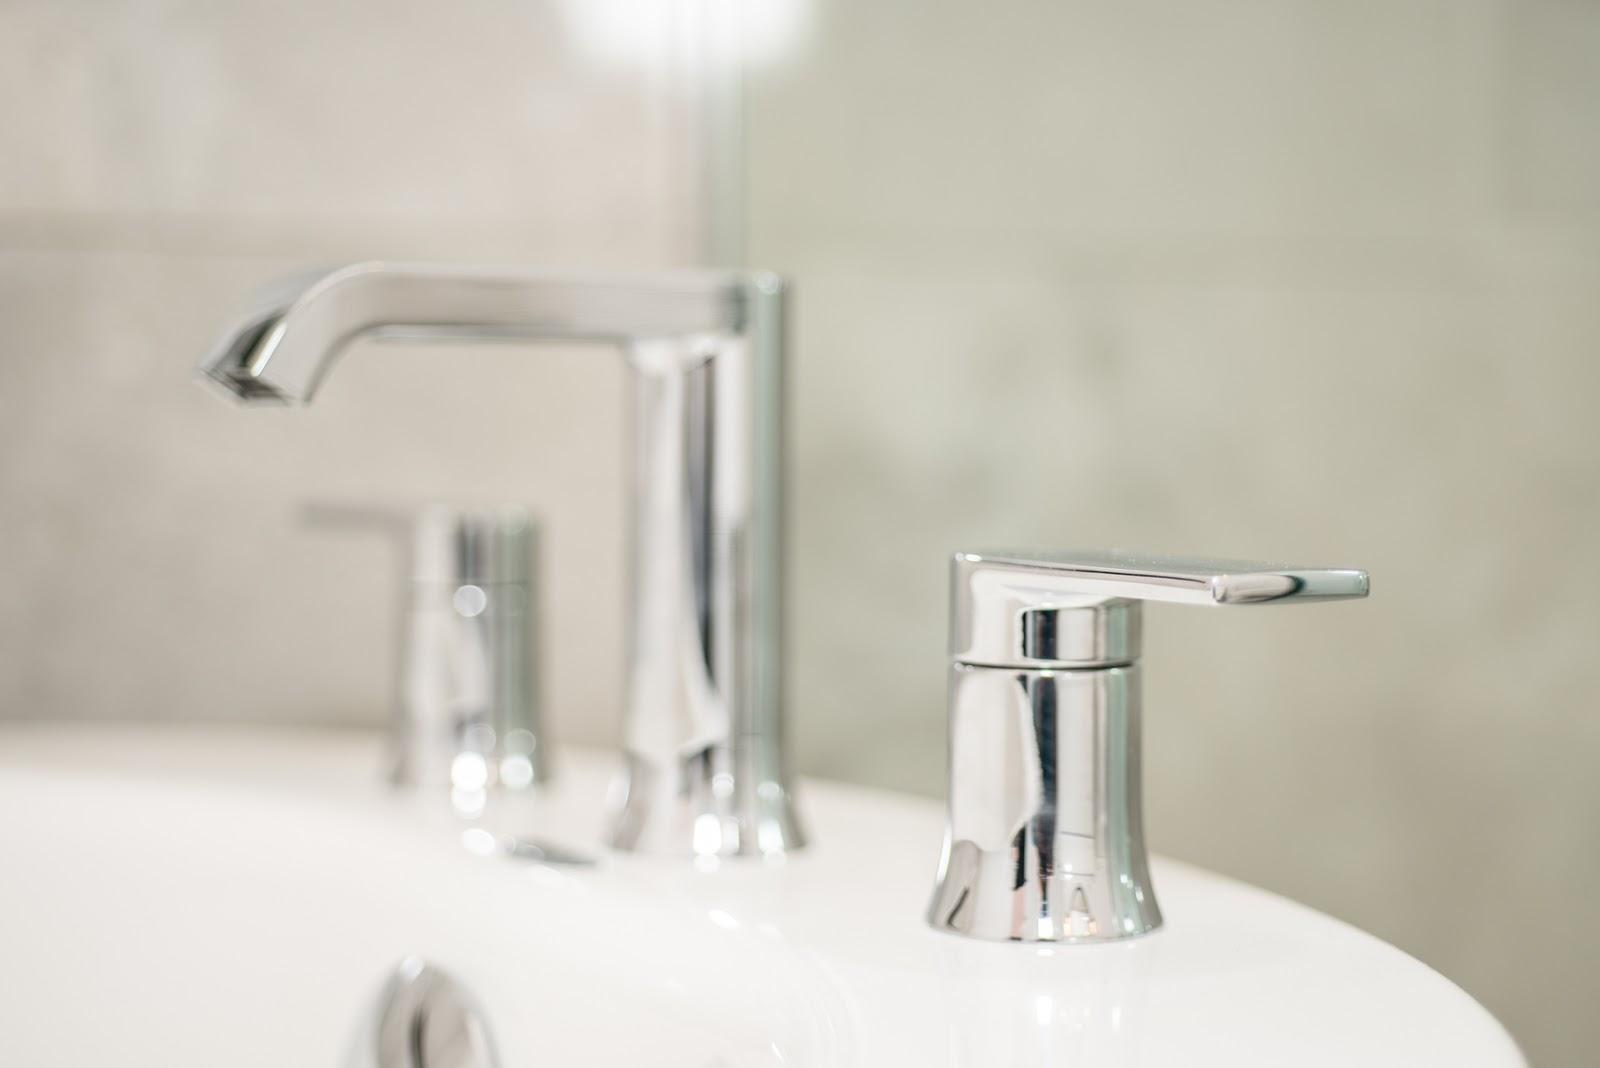 tub faucet